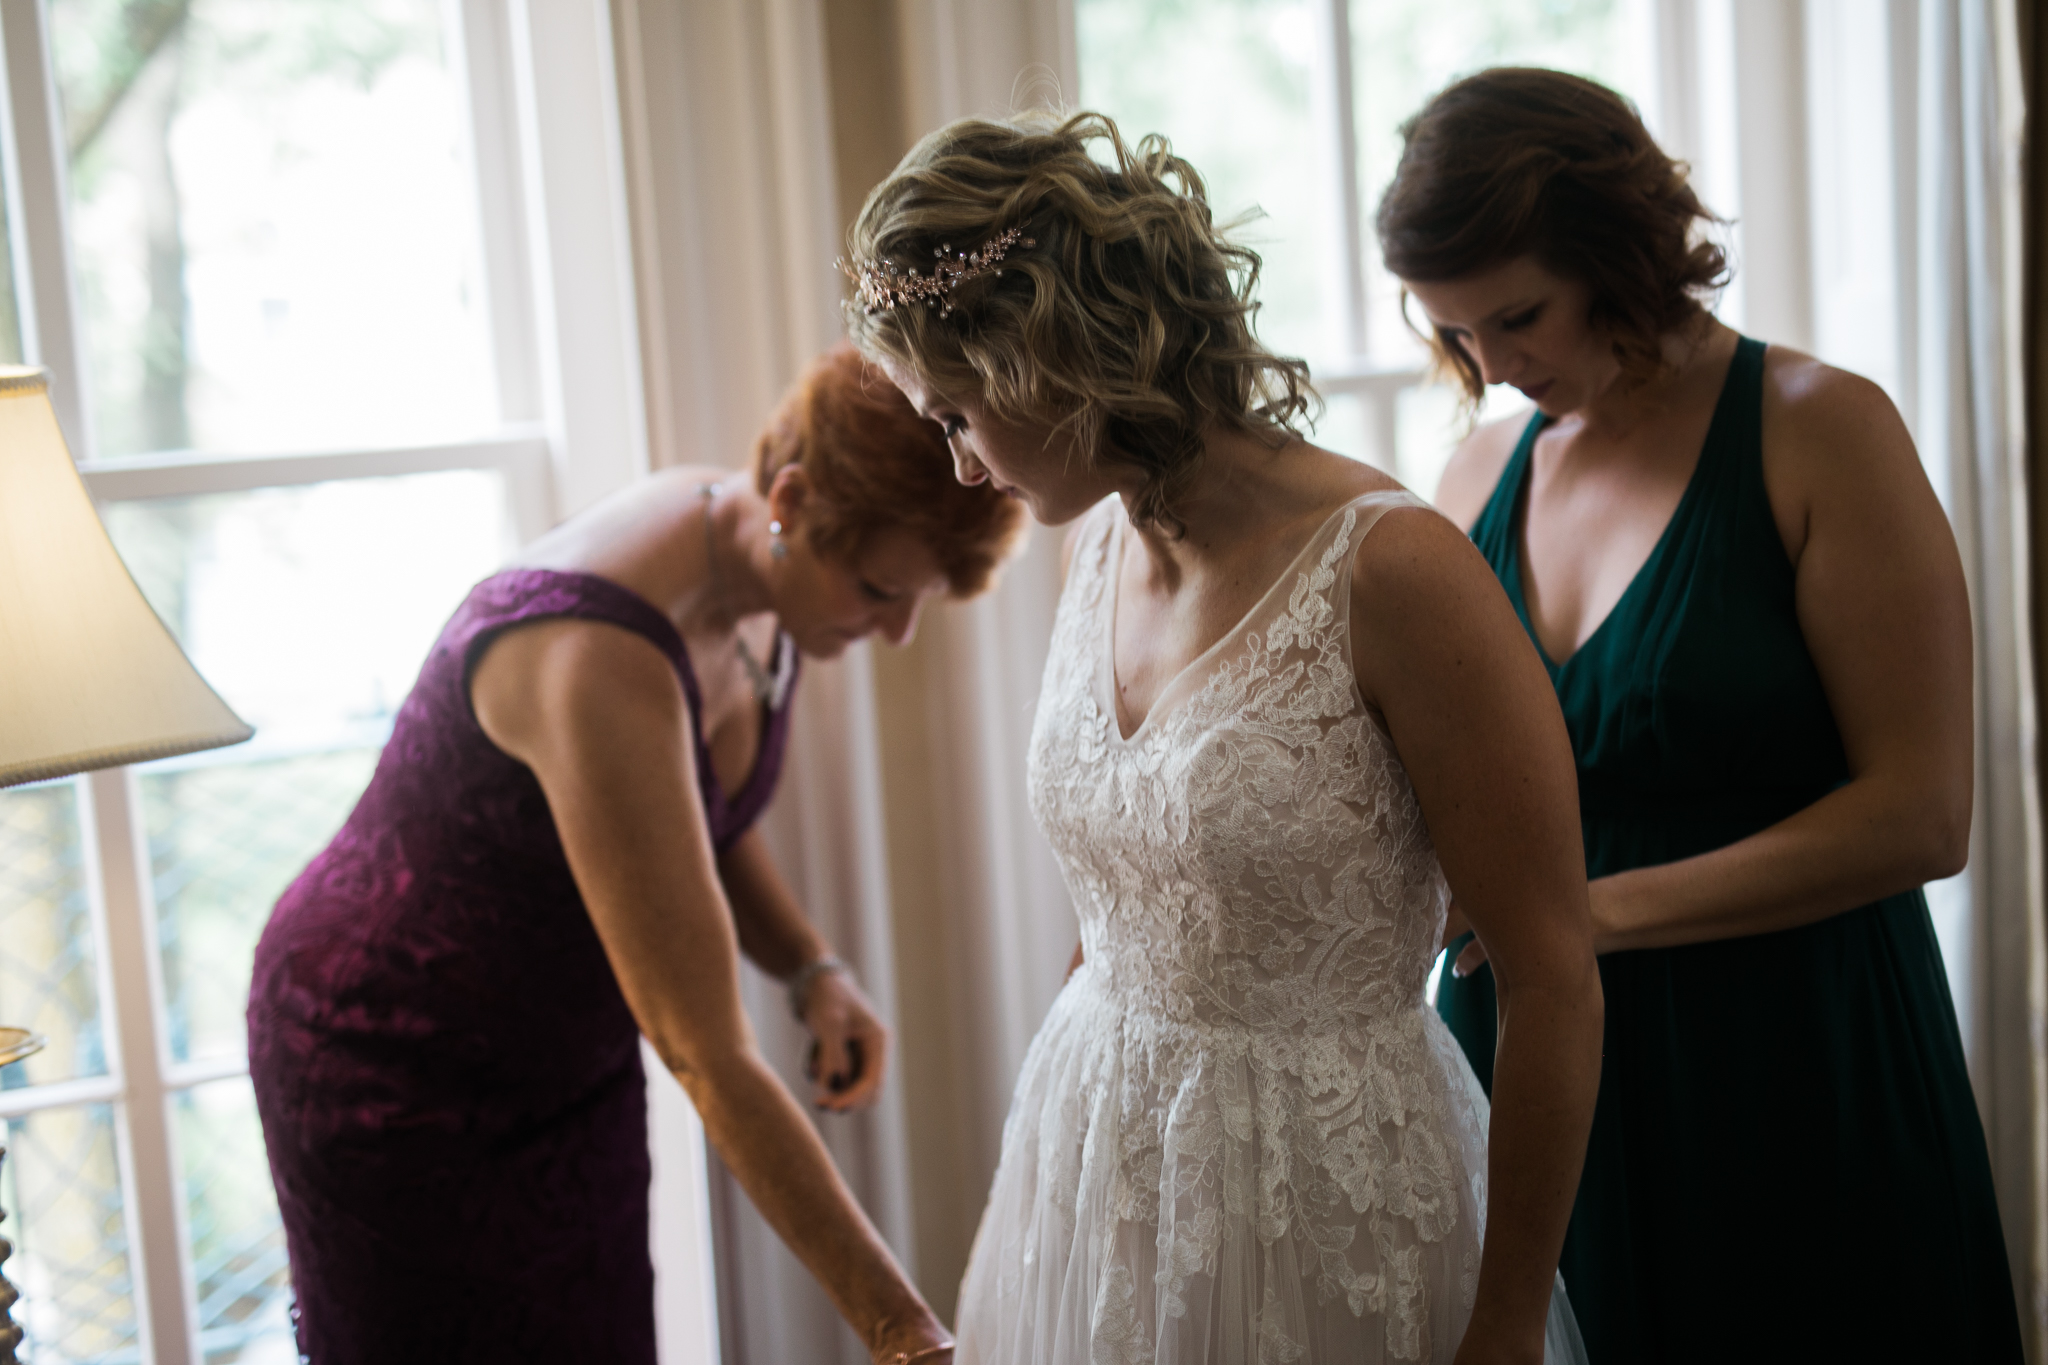 Paoli-Mill-wedding-summer-Wisconsin_019.jpg